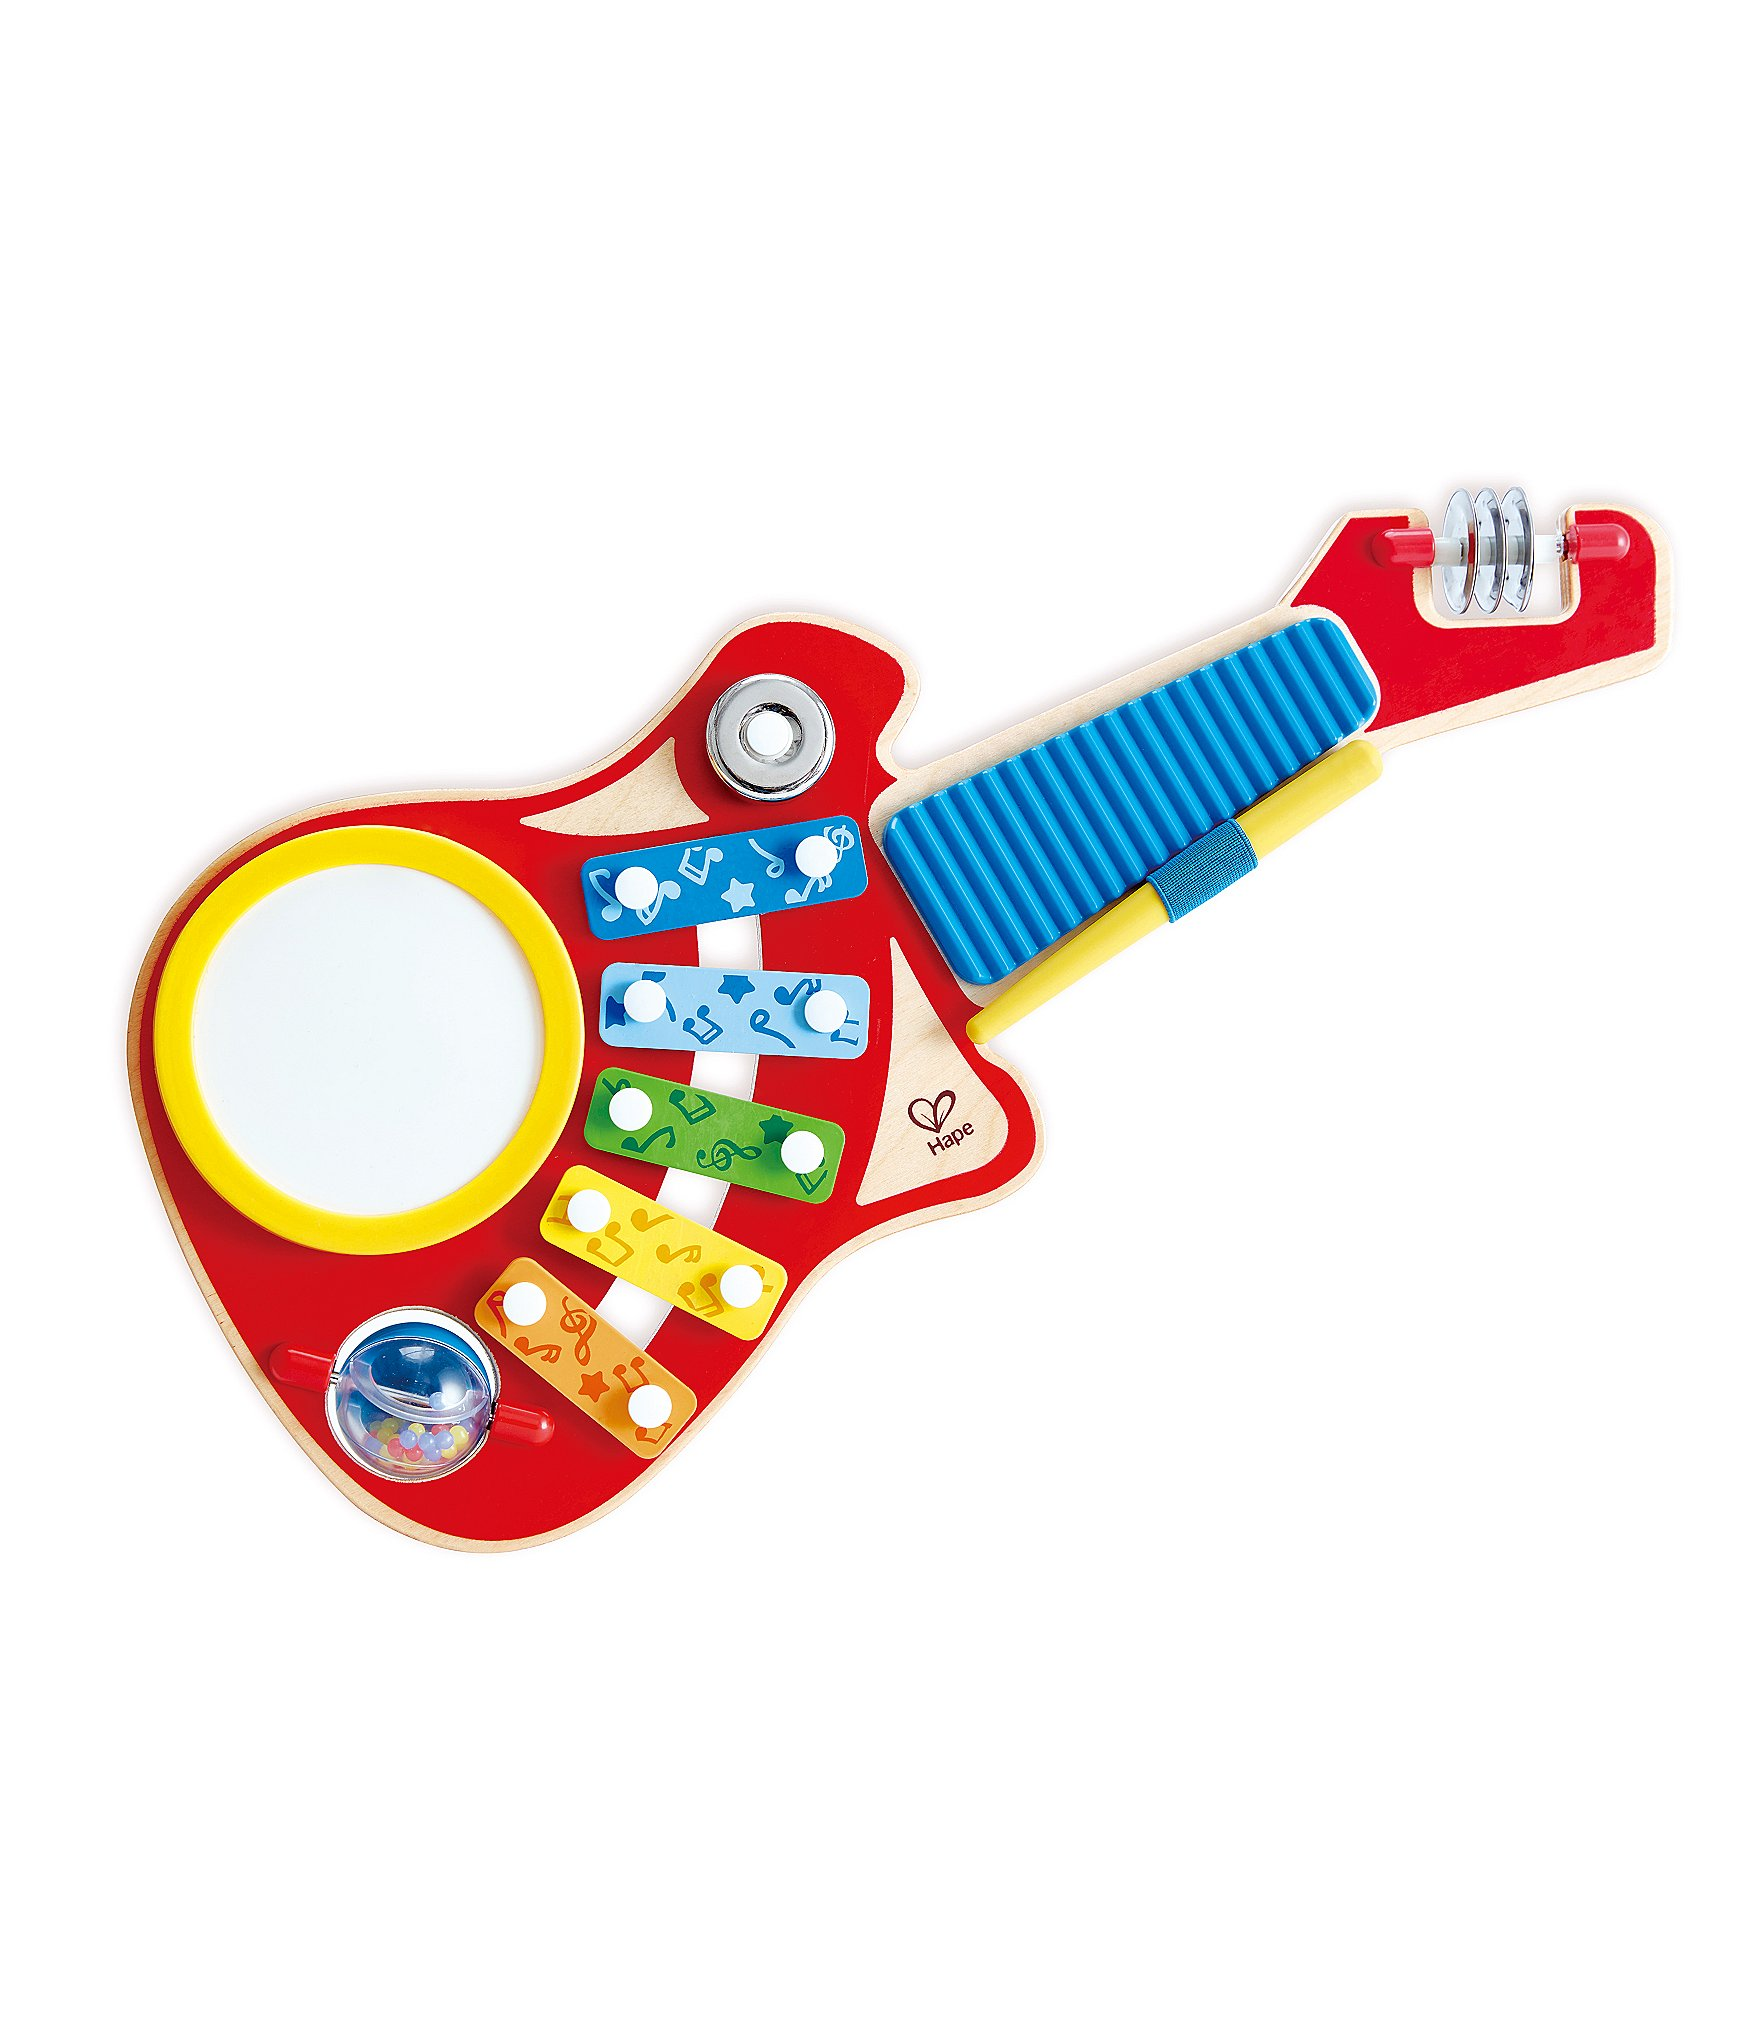 Hape Instrumental 6 In 1 Music Maker Toy